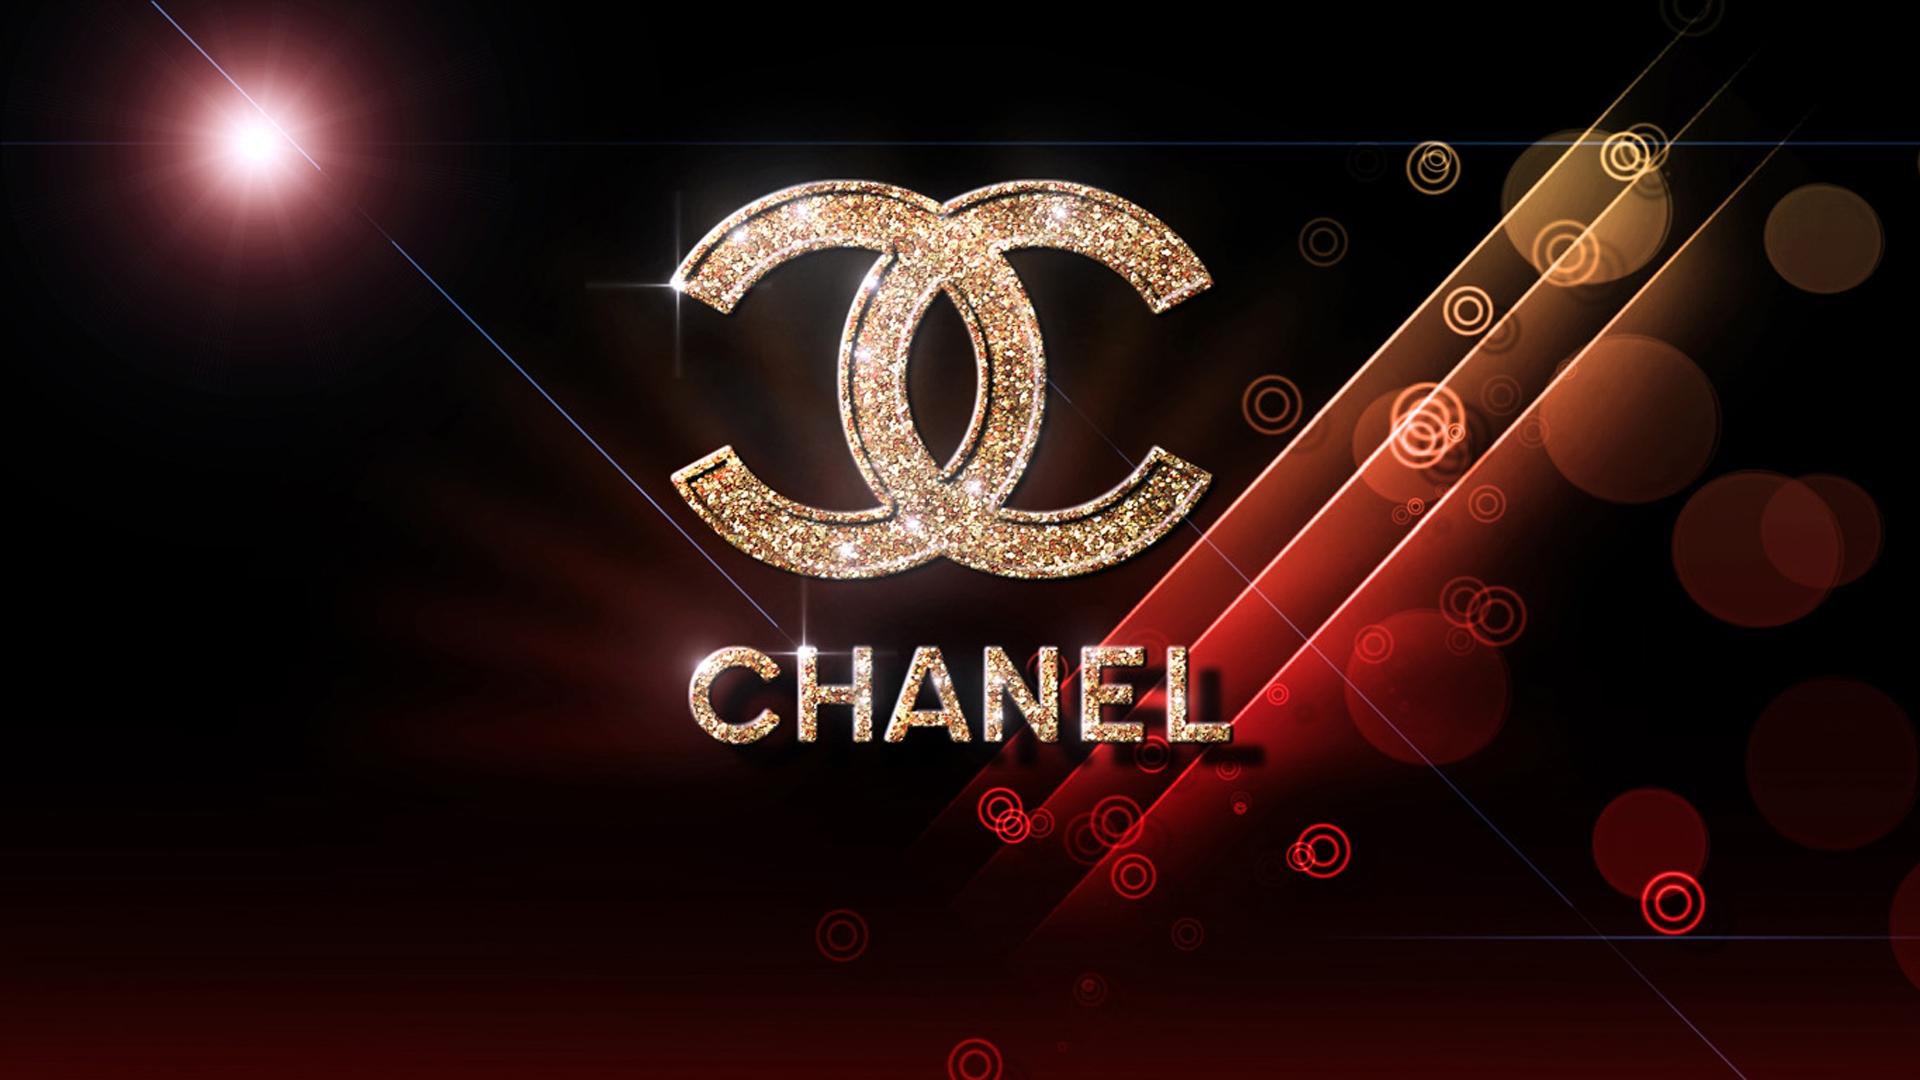 Chanel Quotes Desktop Wallpaper QuotesGram 1920x1080